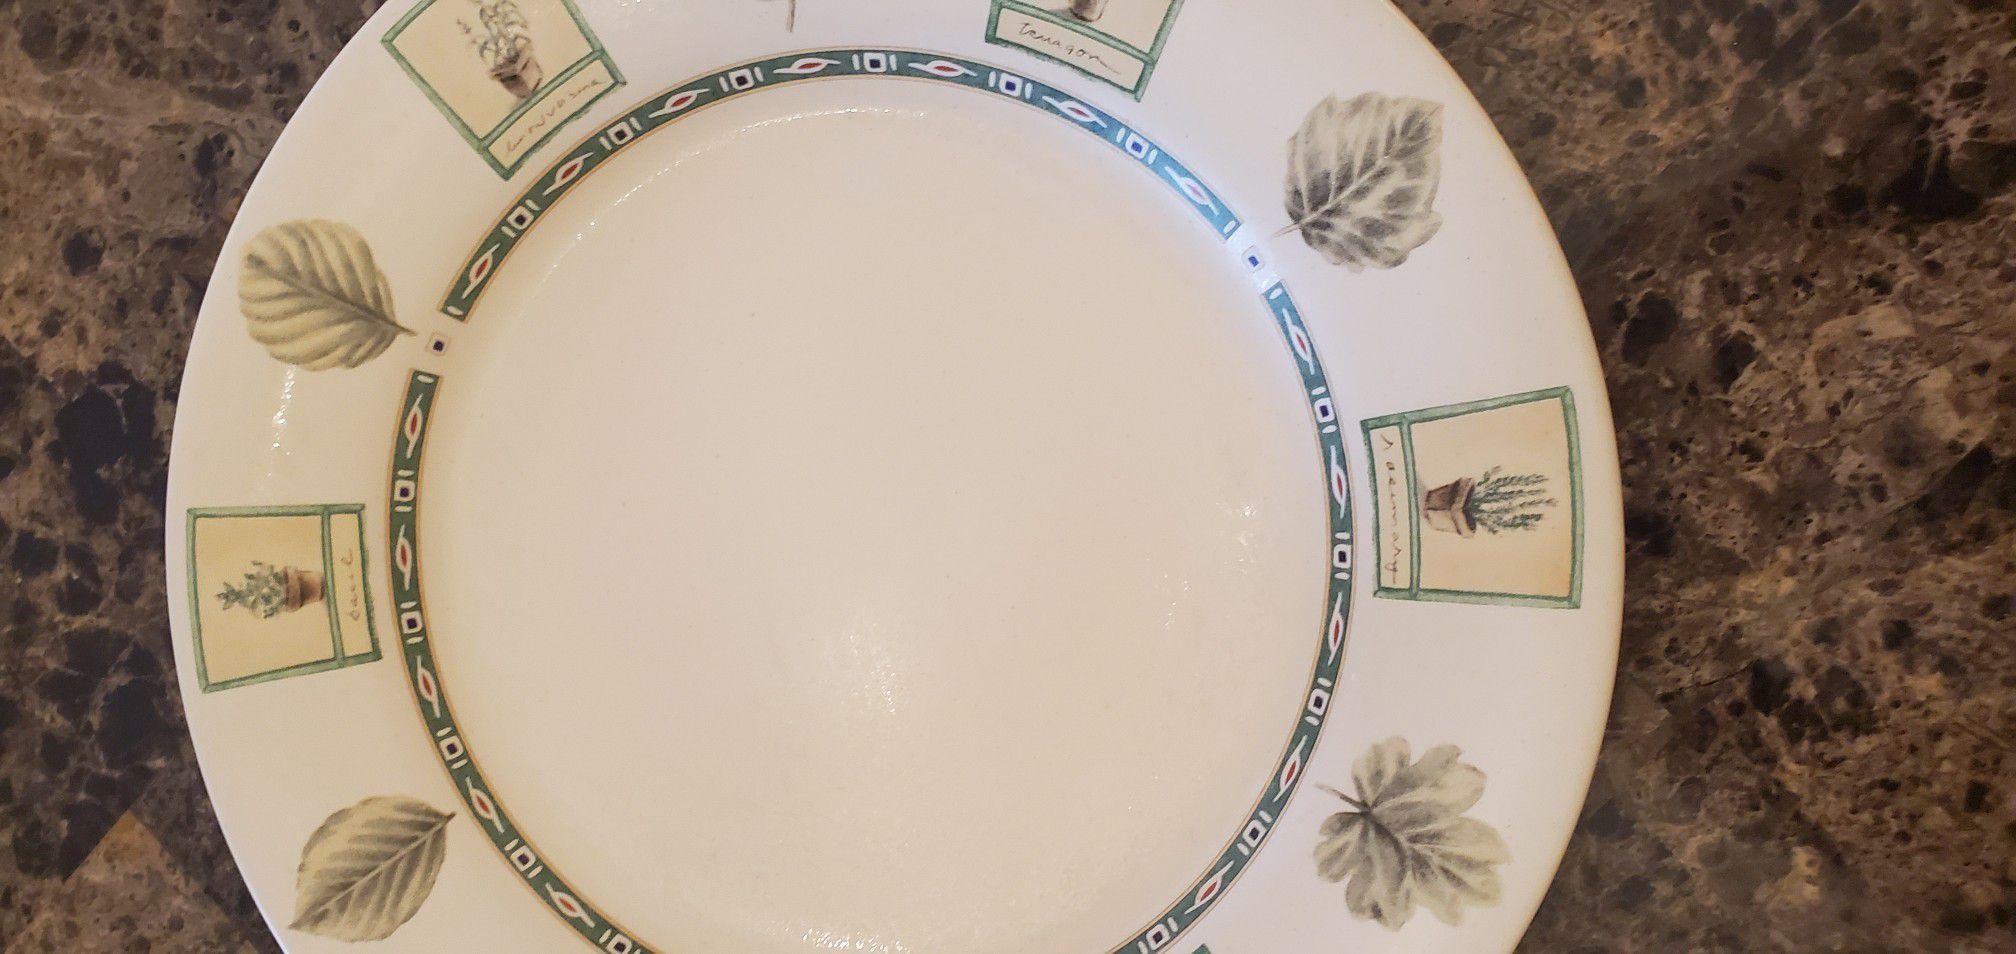 Pfaltzgraff dish setting for four - Naturewood